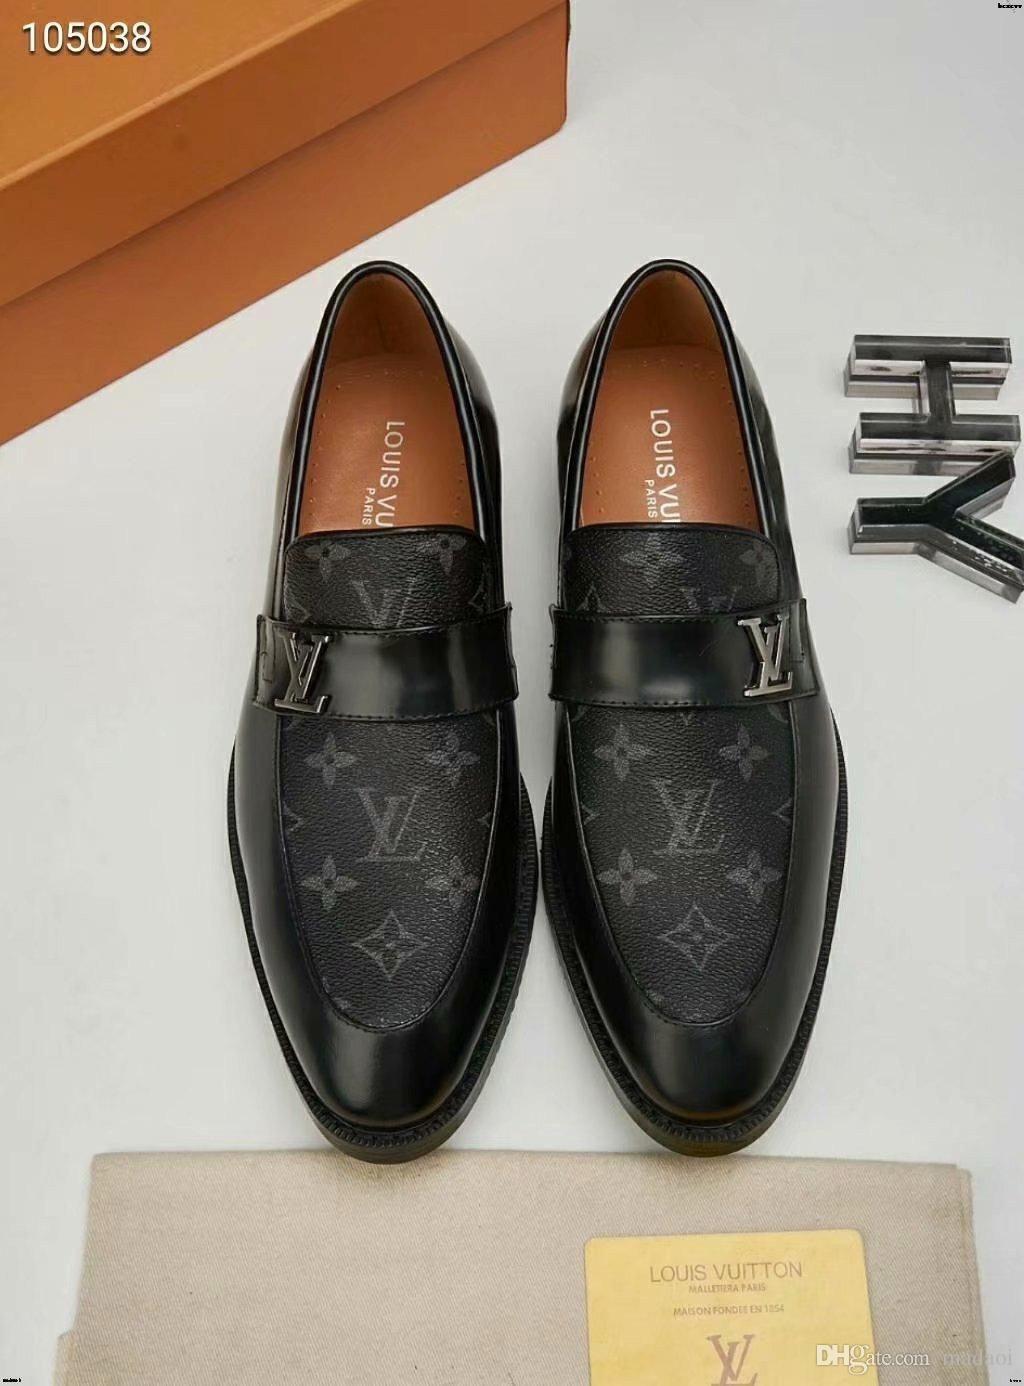 19MM designers chaussures en cuir formel MAN marques de luxe robe chaussures bureau de mariage chaussures hommes oxfords pour UTH italien mocassins YETC0